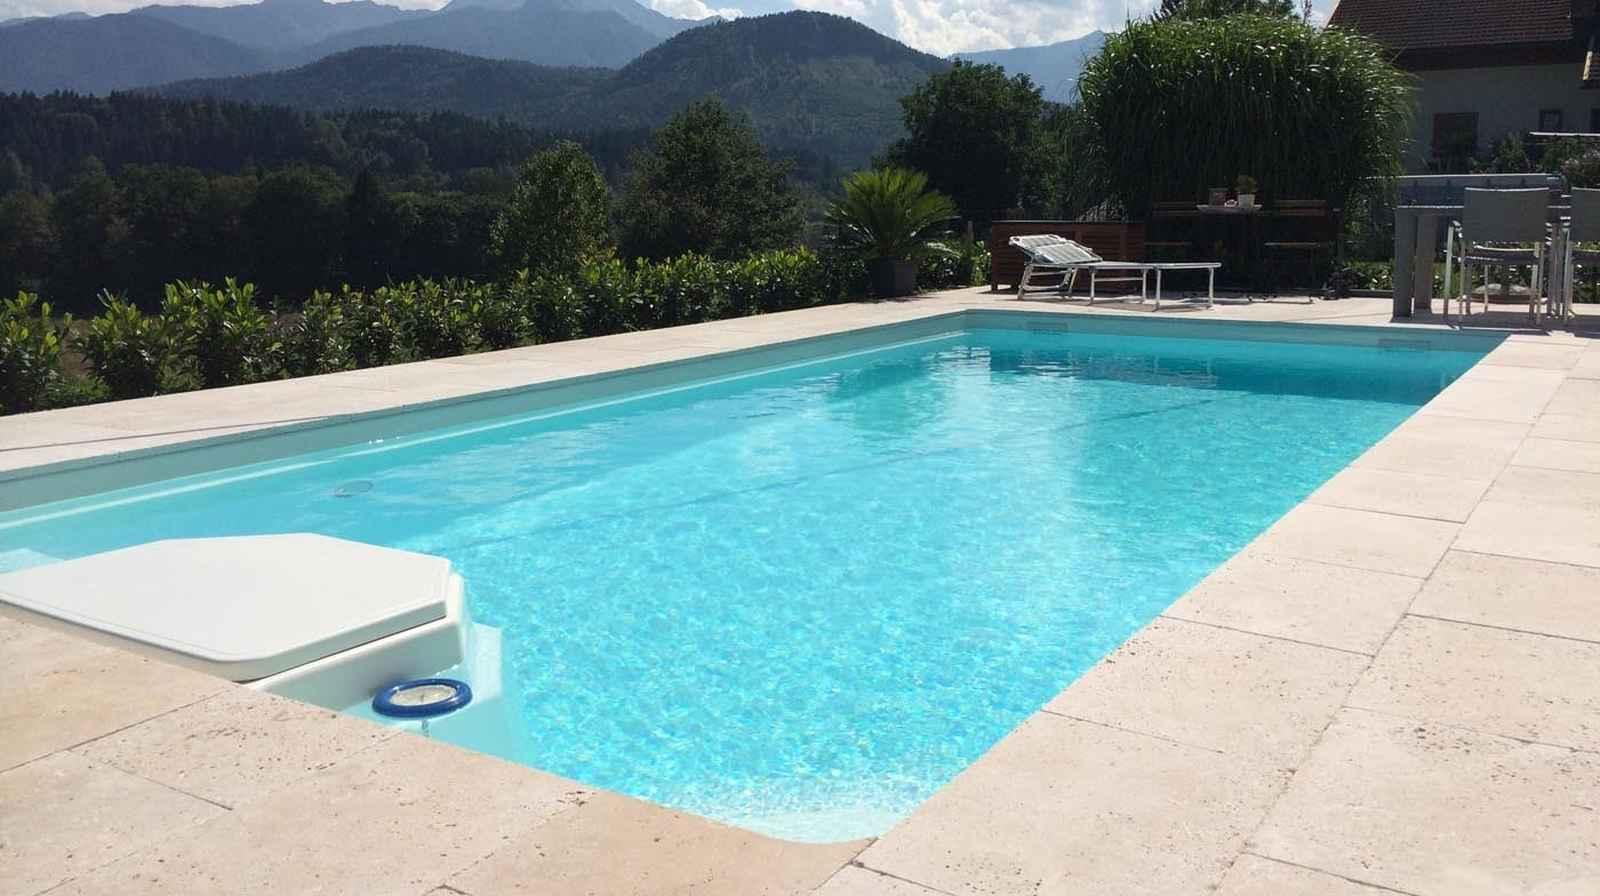 Modell bali 80 schwimmbadtechnik frankfurt - Pool mit stahlrahmen ...